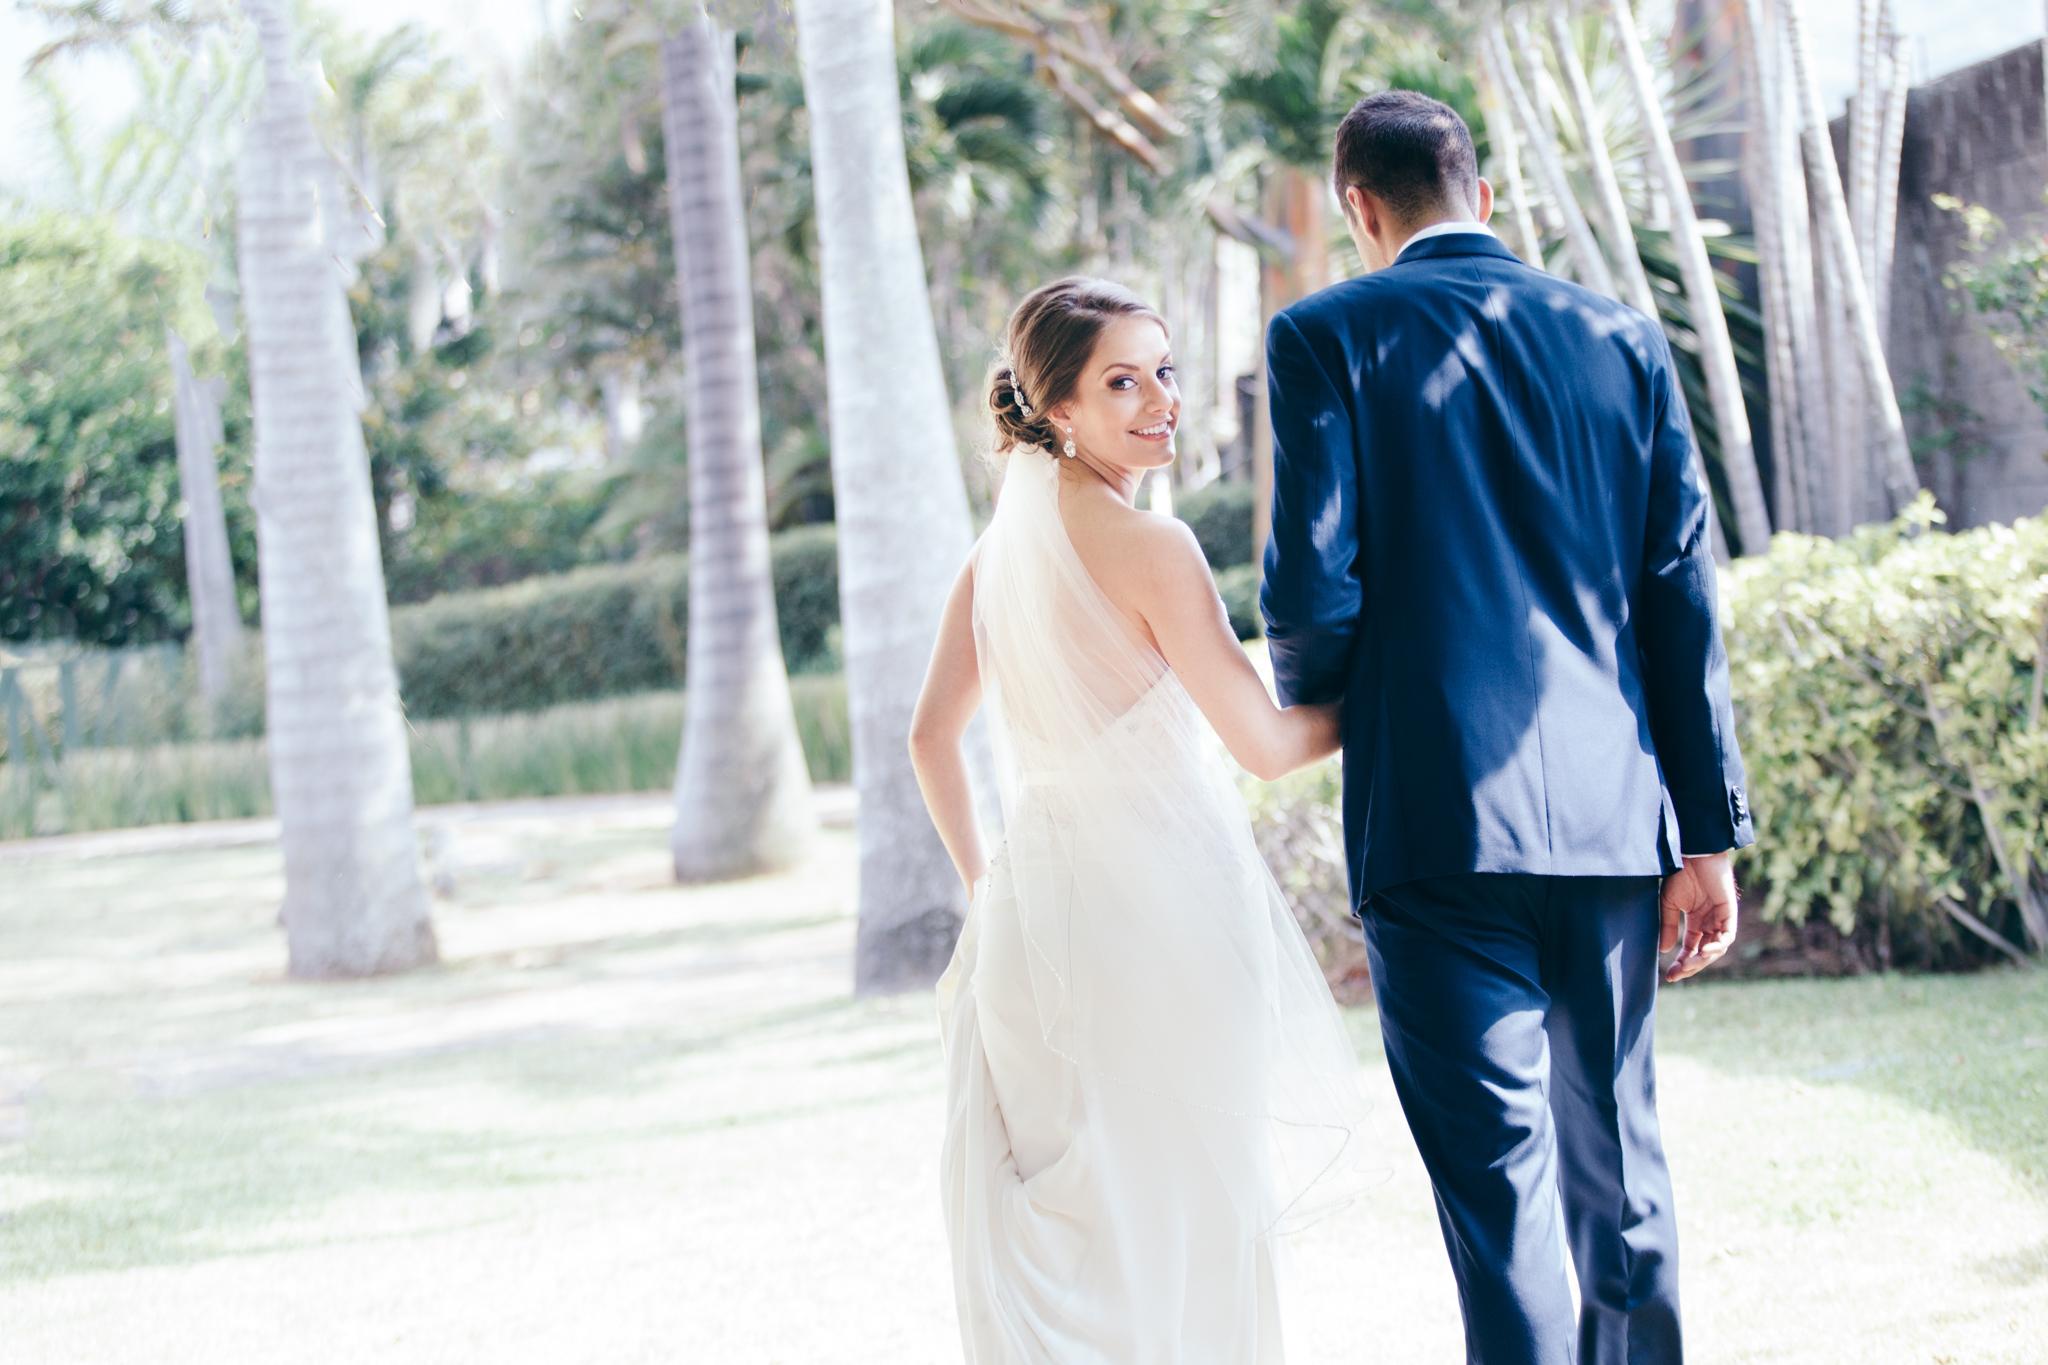 Samantha and kyle wedding